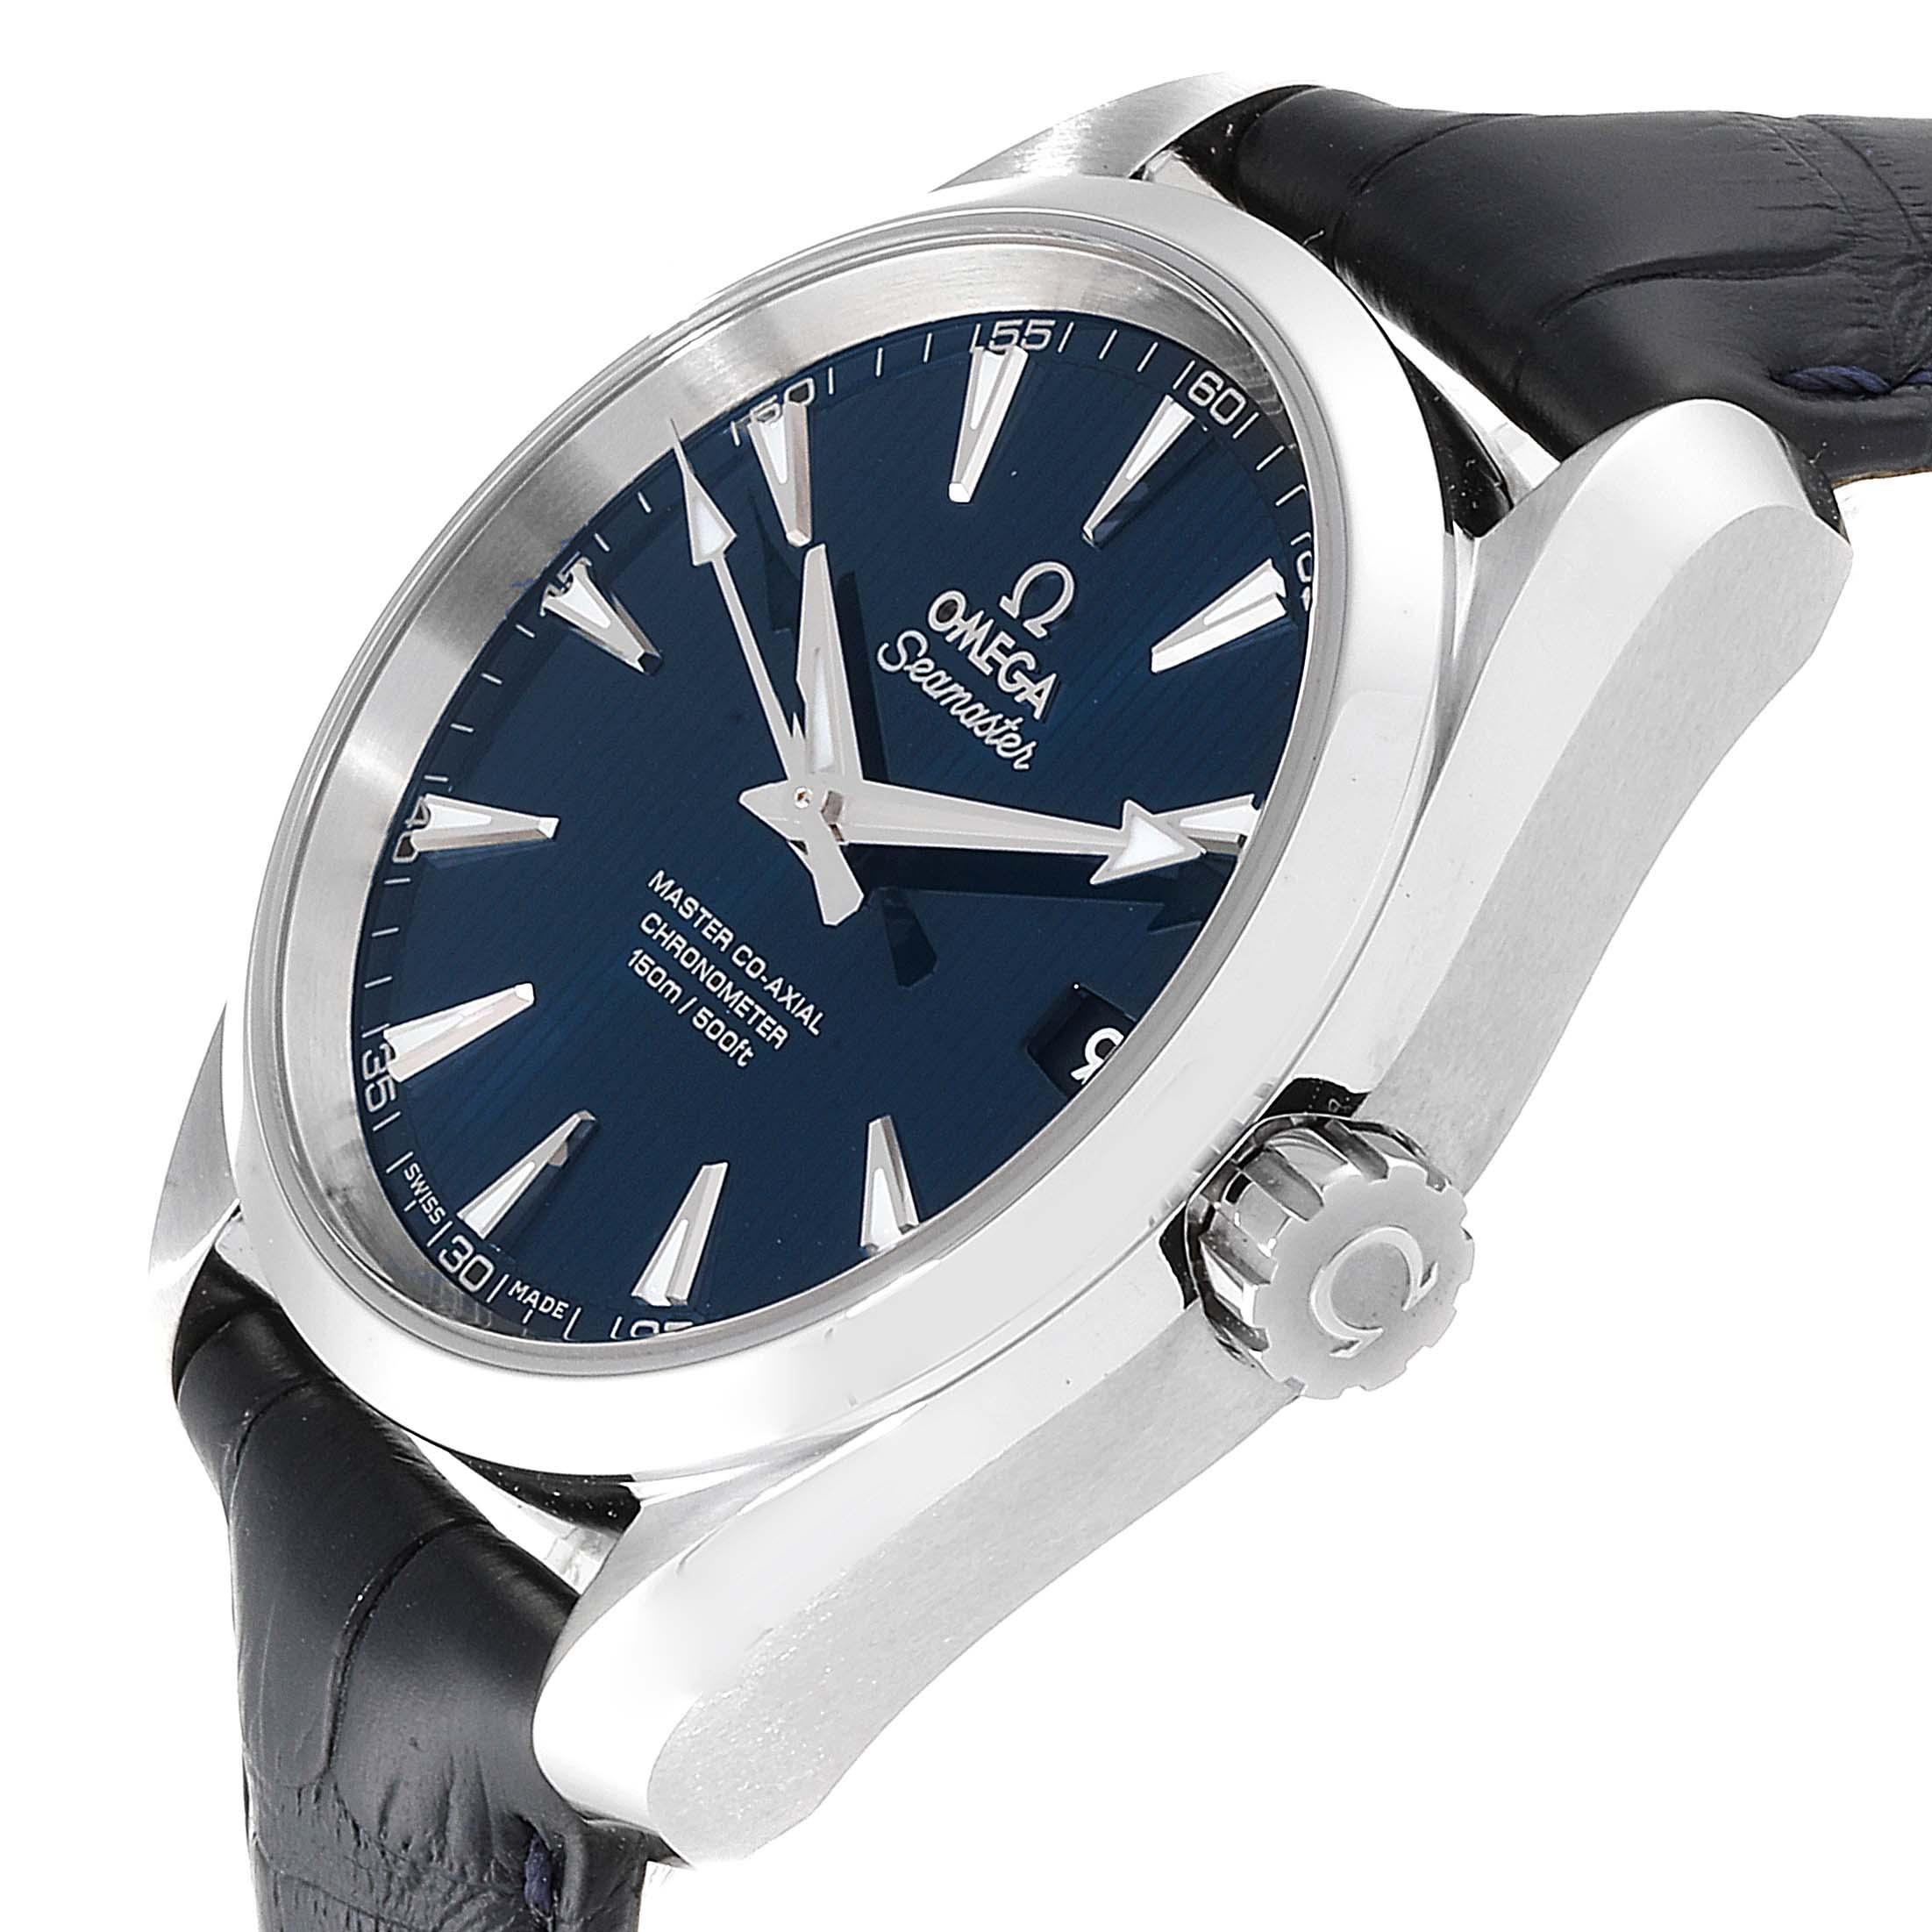 Omega Seamaster Aqua Terra Blue Dial Watch 231.13.39.21.03.001 Box Card SwissWatchExpo